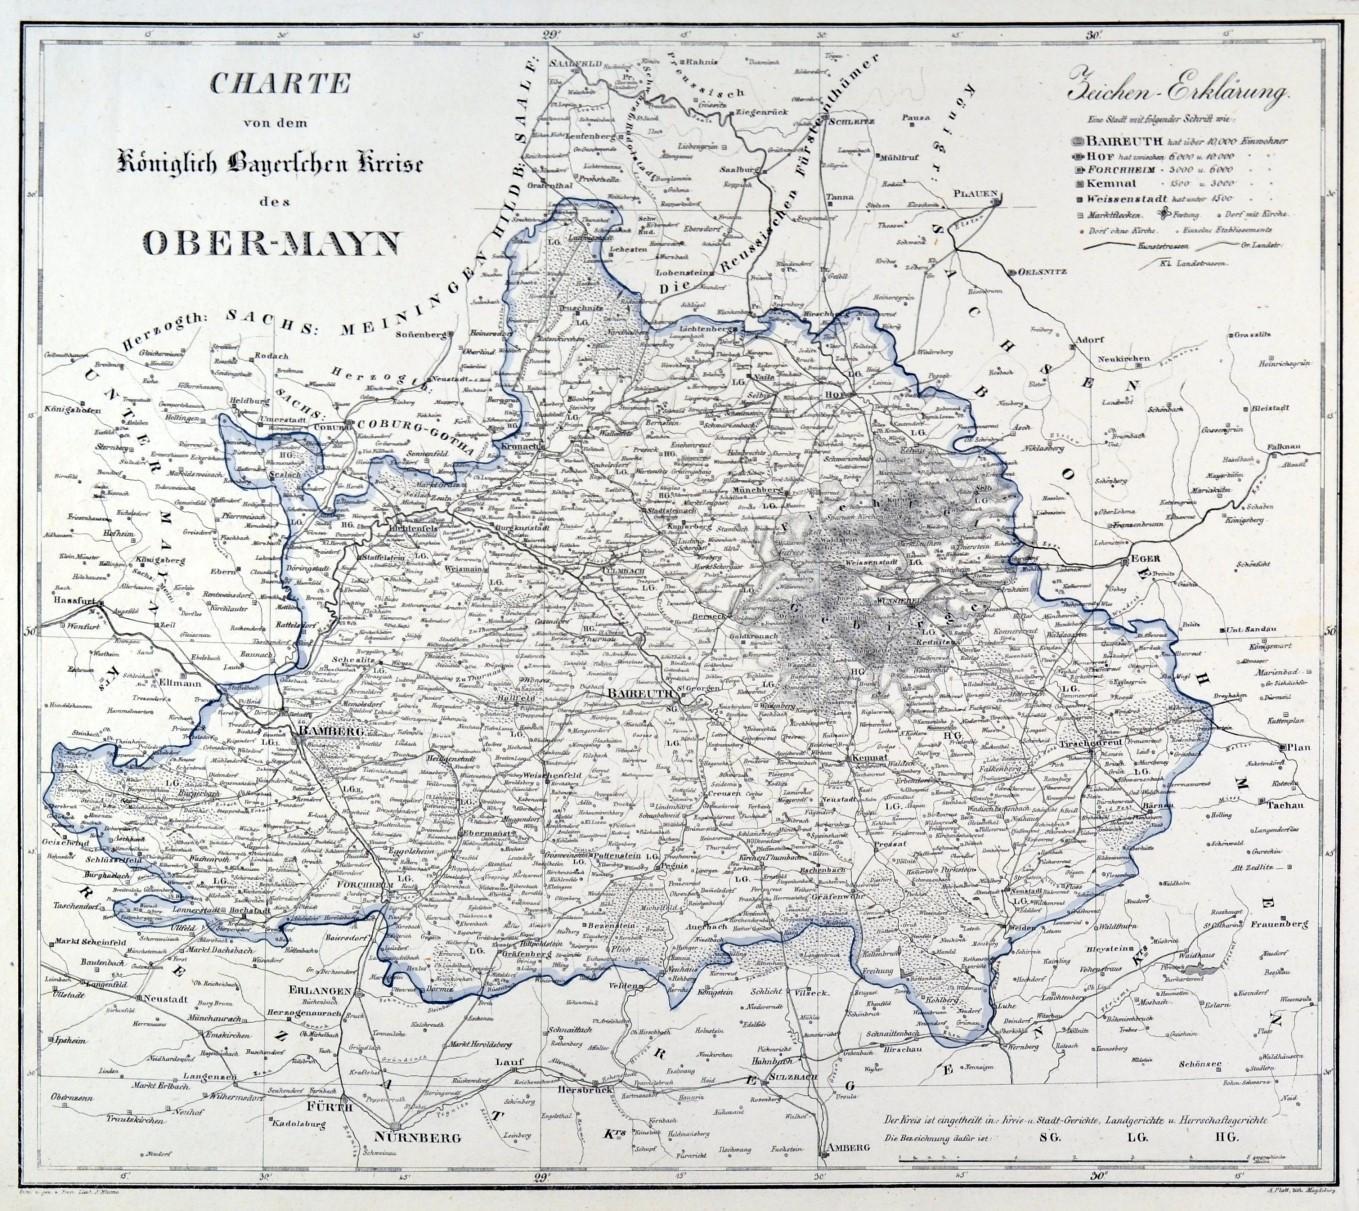 Oberfranken Karte.Franken Oberfranken Karte Zvab